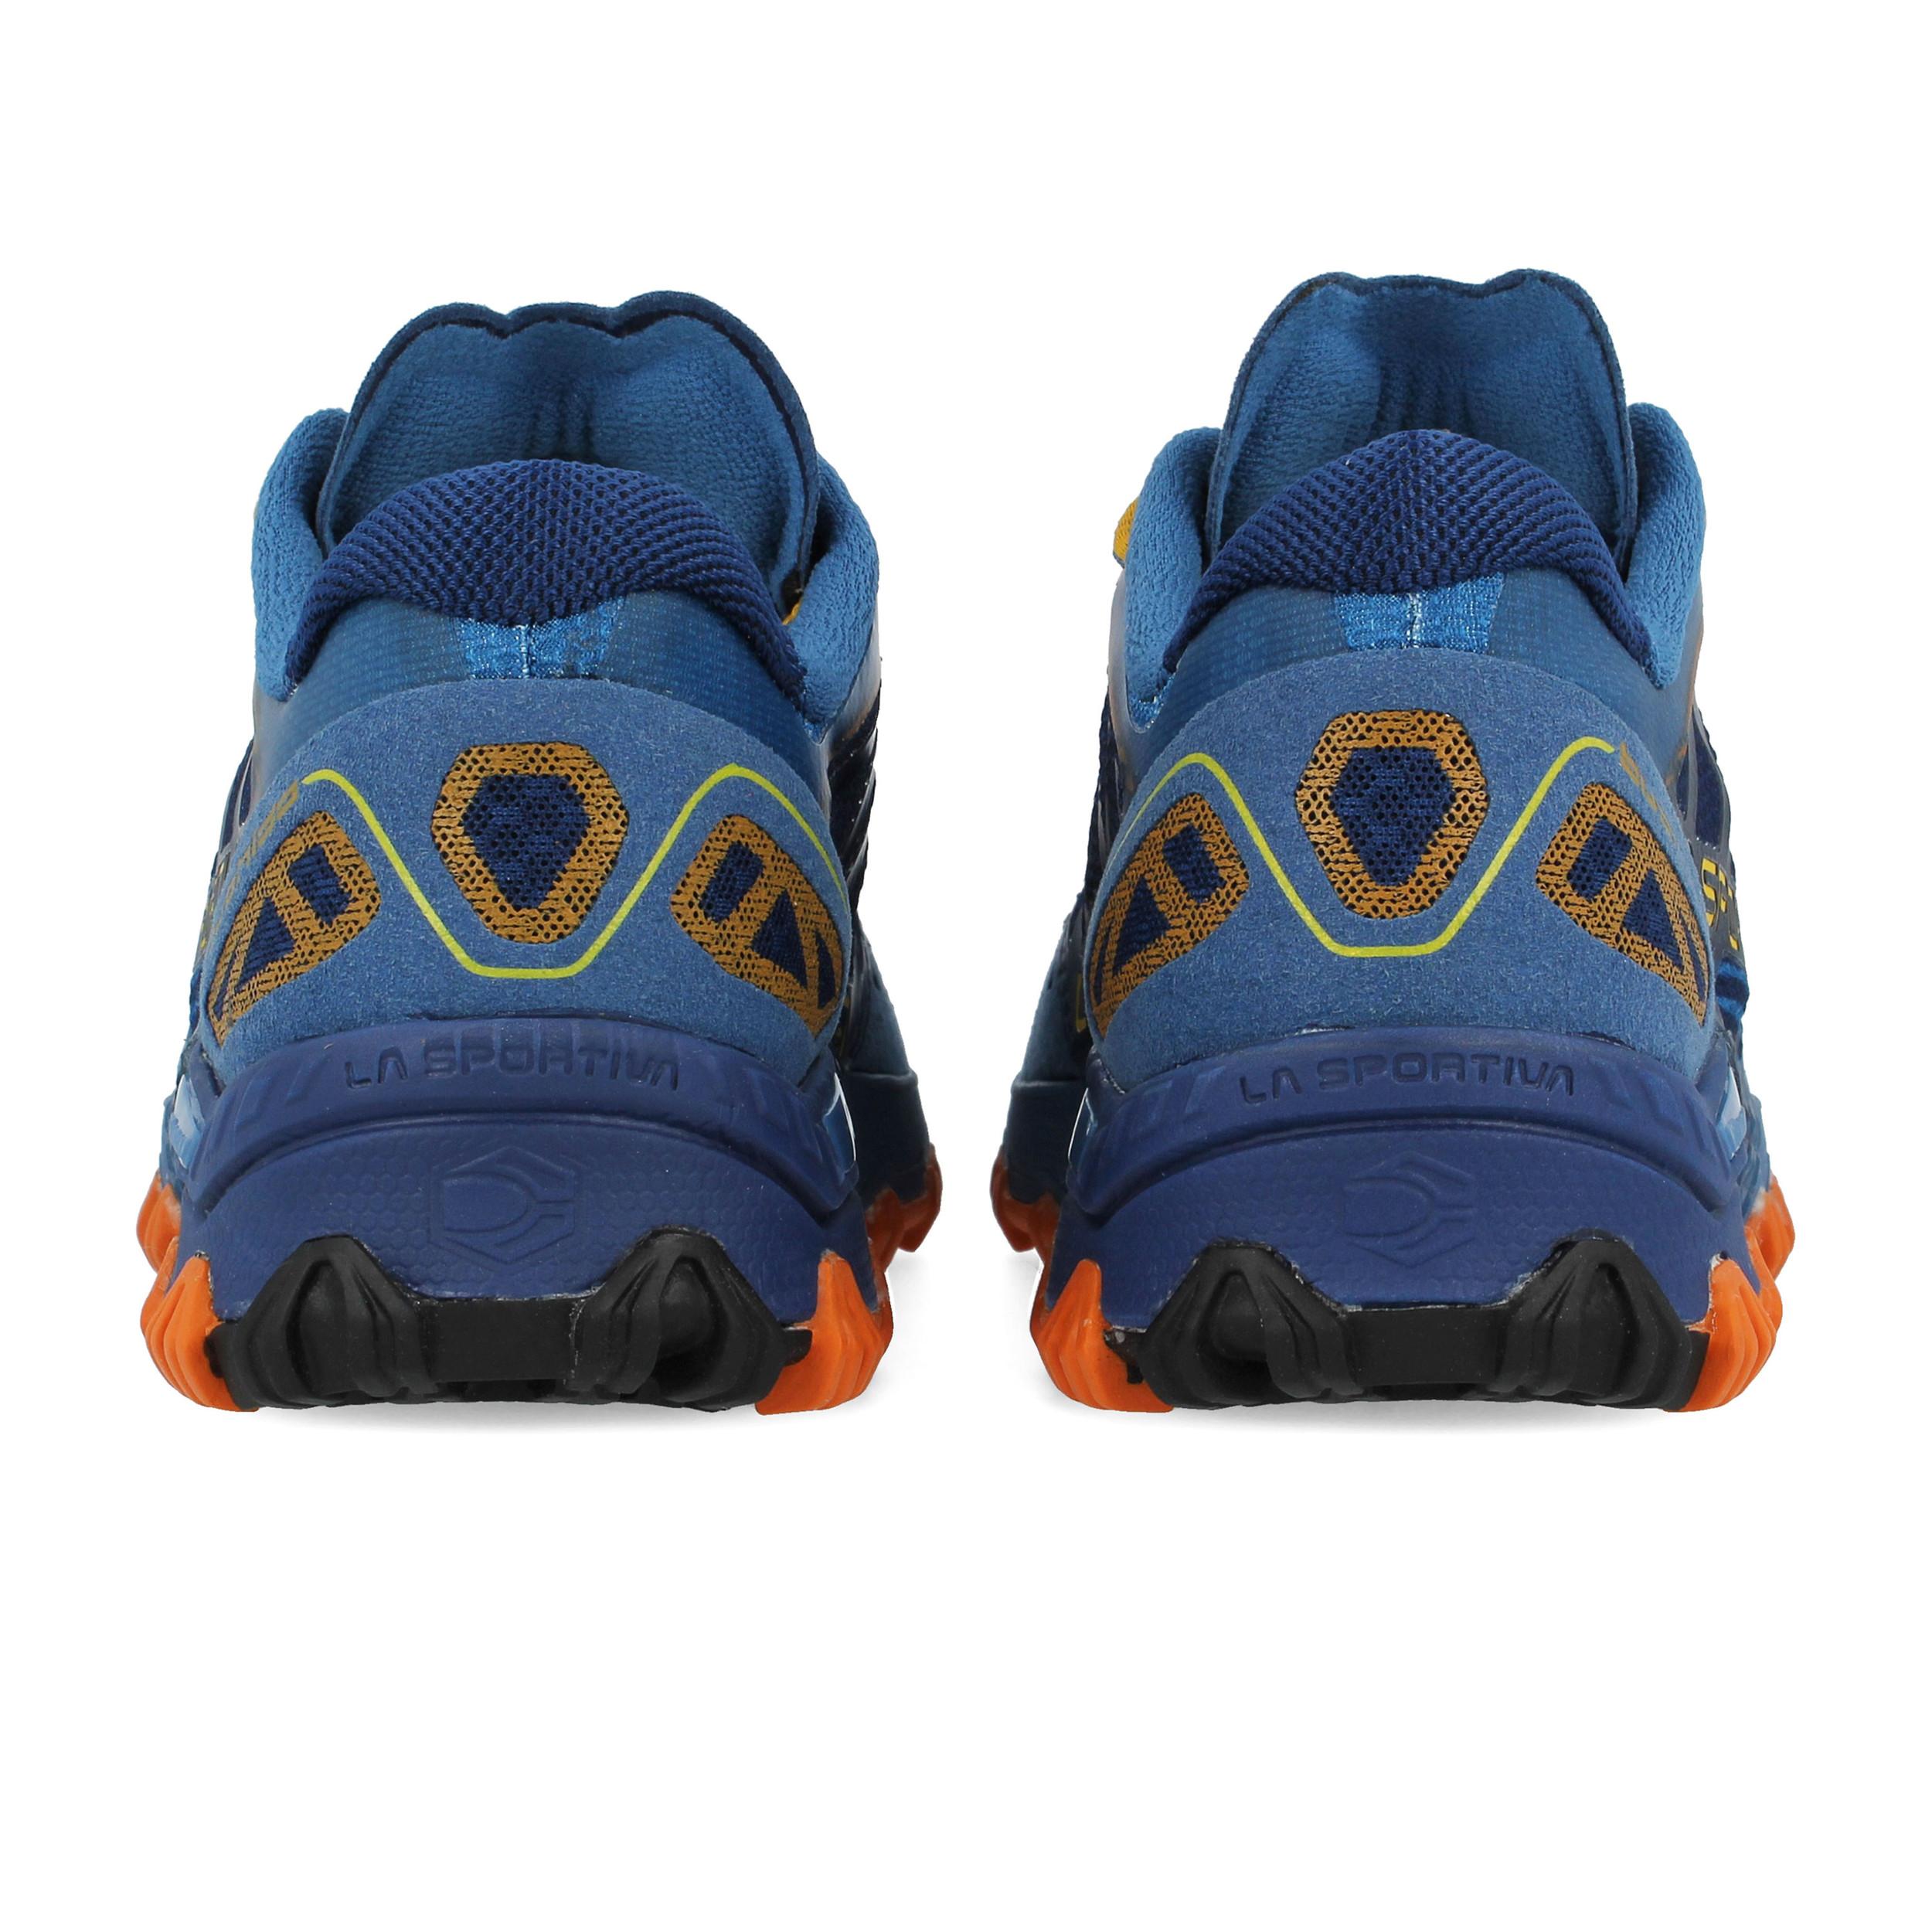 04173c4e8cc925 La Sportiva Bushido Herren Trail Laufschuhe Jogging Sport Schuhe ...